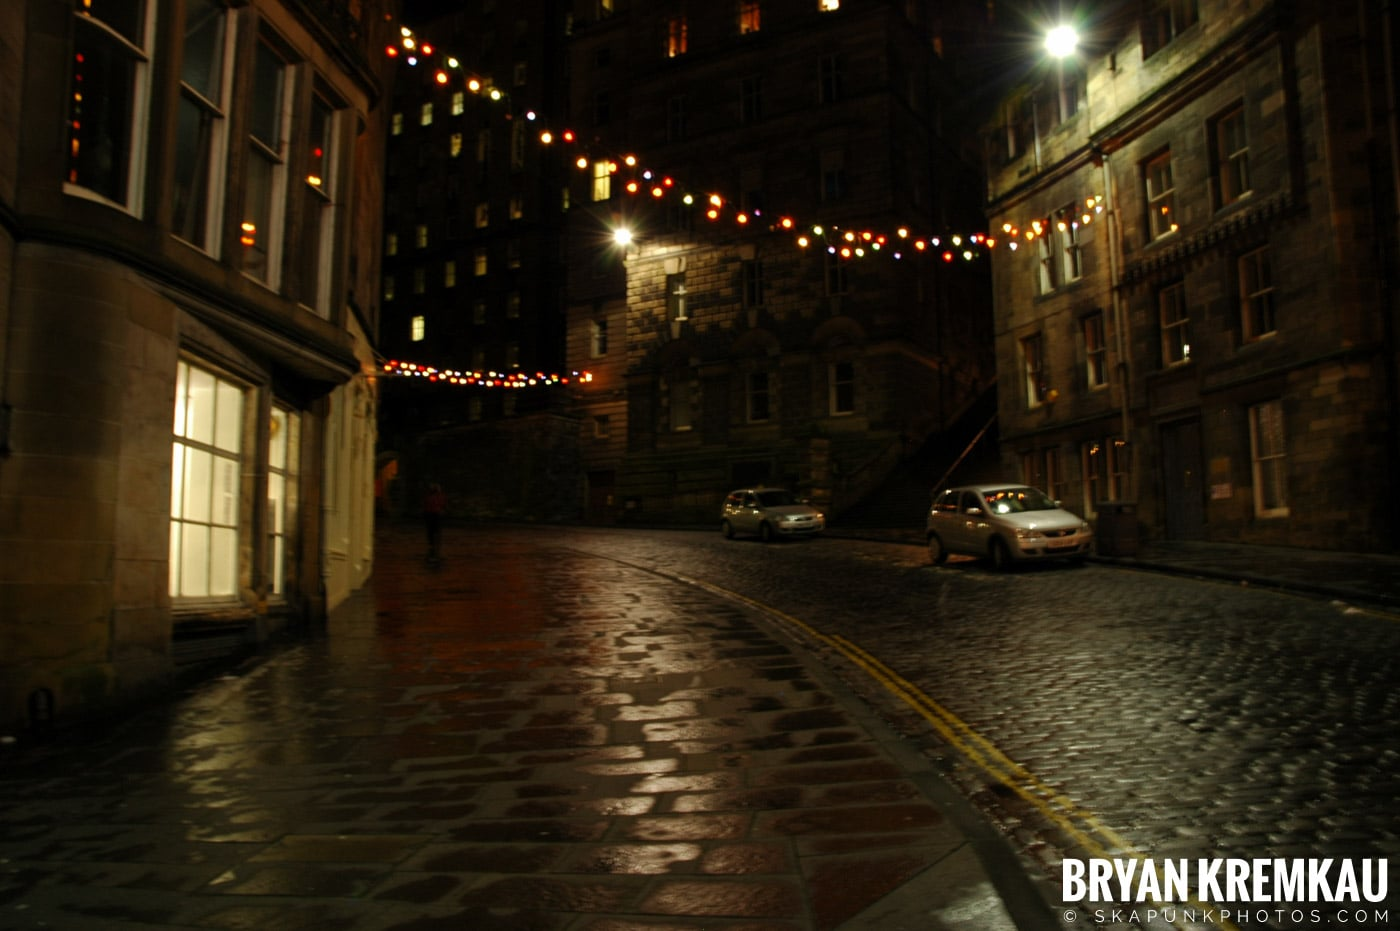 Edinburgh, Scotland - Day 1 - 12.12.06 (1)